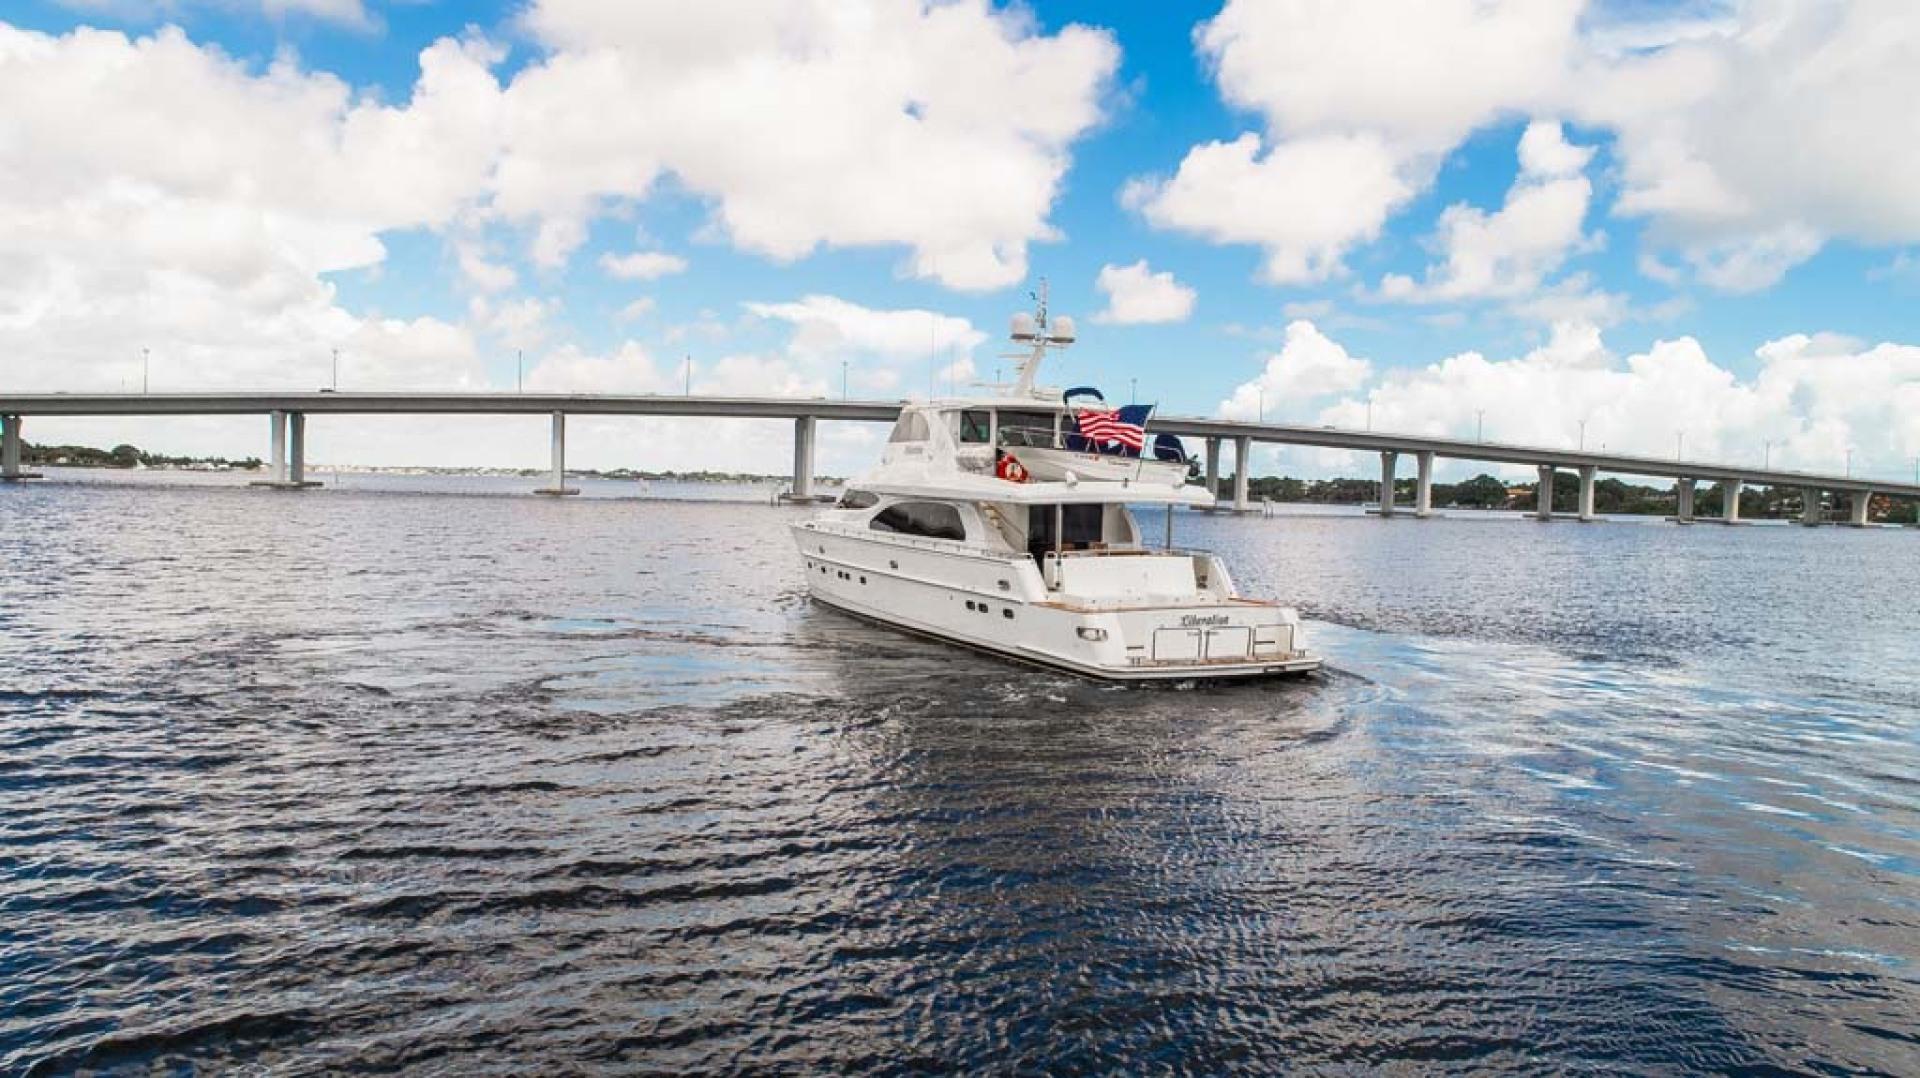 Horizon-Cockpit-Motor-Yacht-2008-Liberation-Stuart-Florida-United-States-Port-Aft-View-1075311